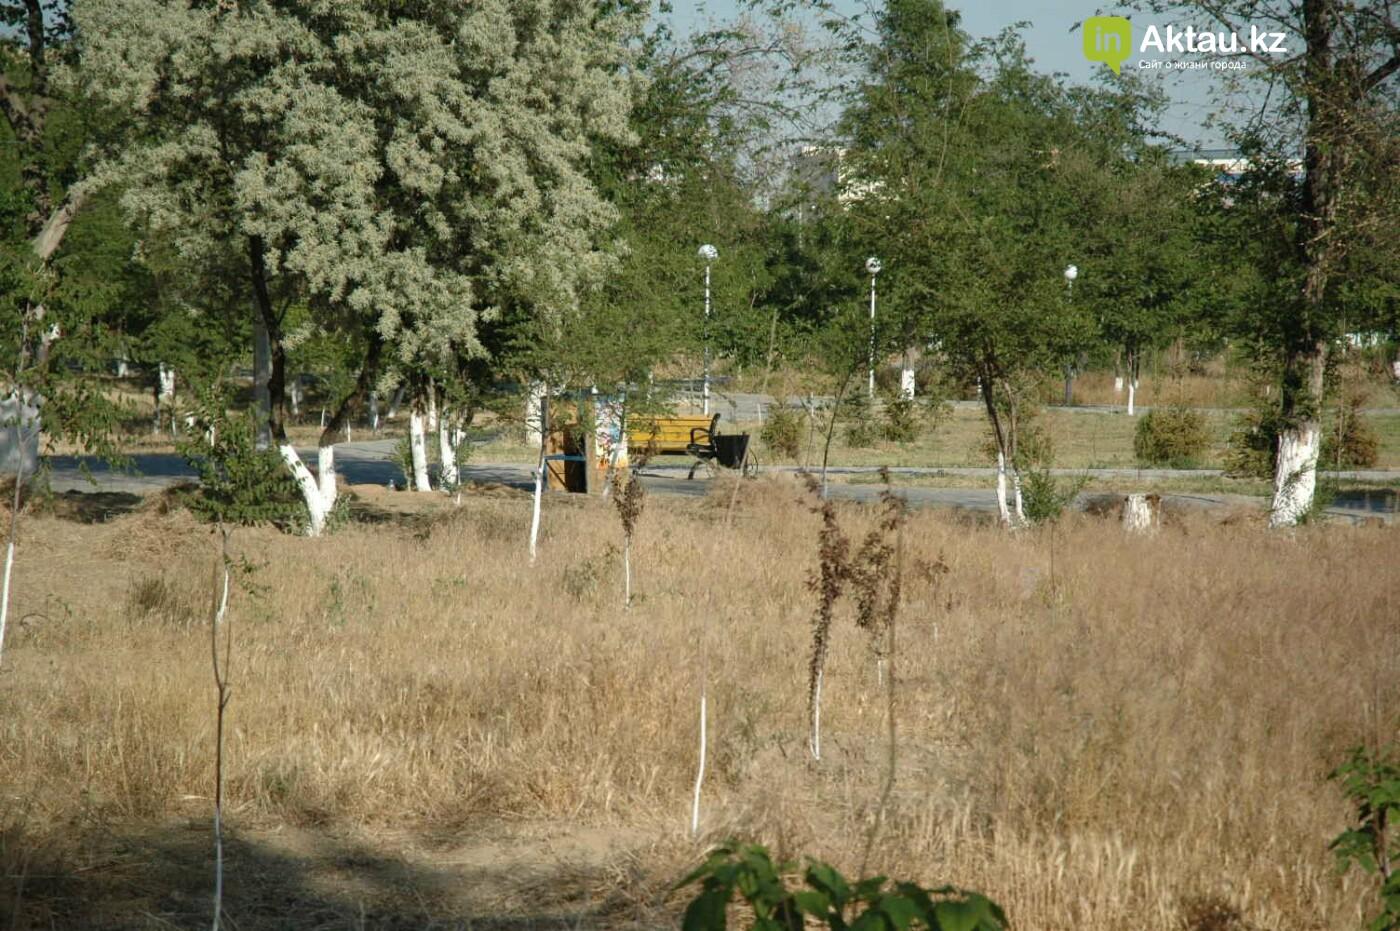 Погибшие от засухи и обезвоживания в Актау исчисляются десятками (ФОТО), фото-48